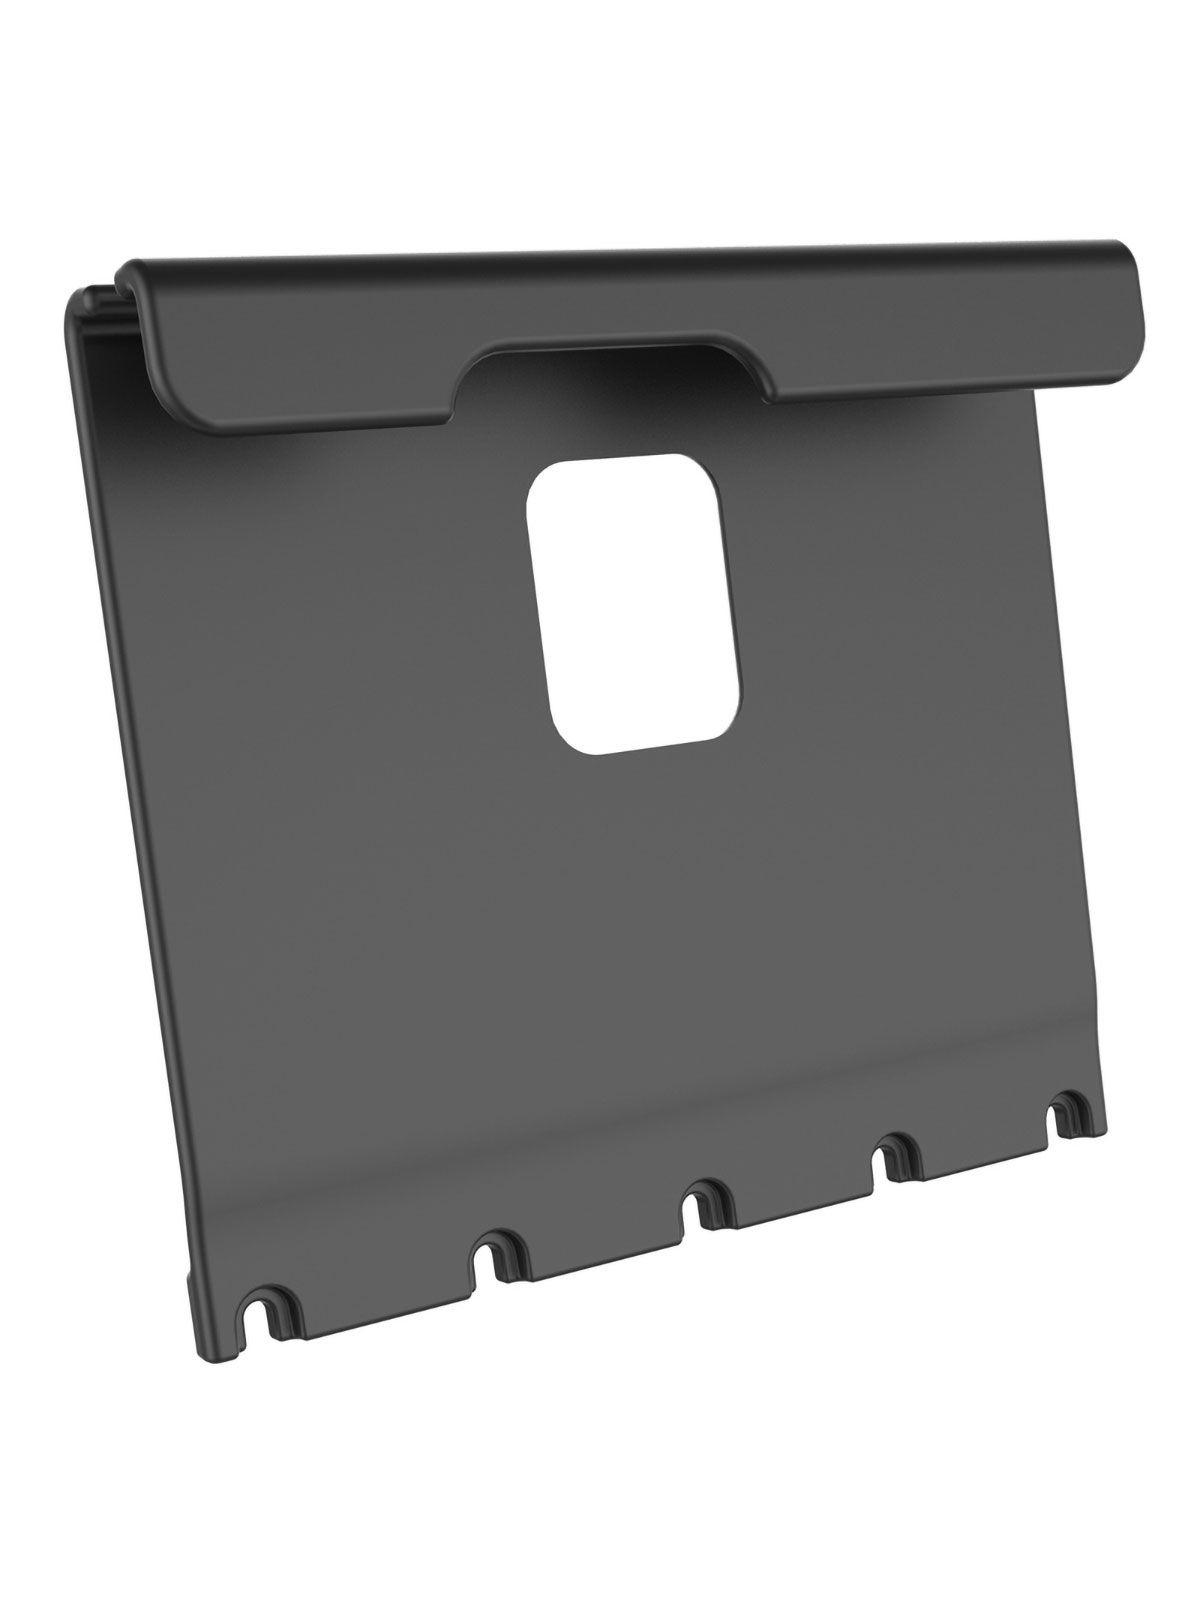 RAM Mounts Endkappe (oben) für GDS Dockingstation Samsung Galaxy Tab S4 10.5 (SM-T830/-T835/-T837)